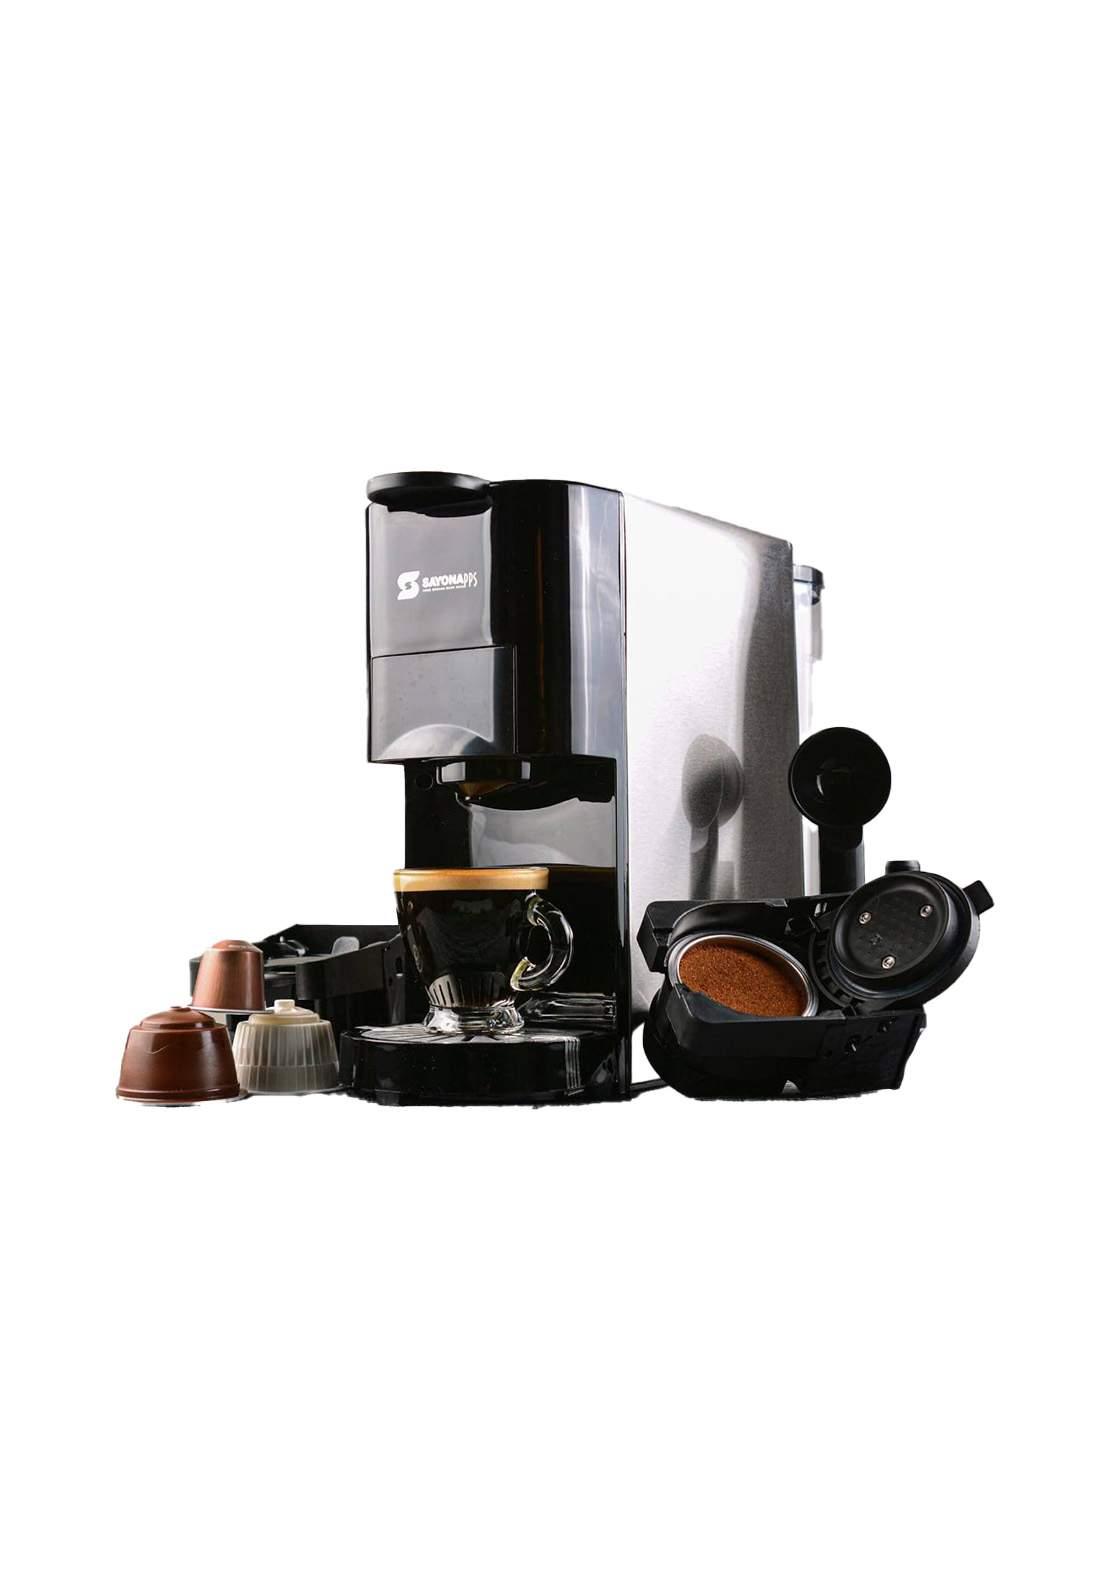 Sayona 4385  Coffee Machine 1450 Watt ماكنة صنع قهوة